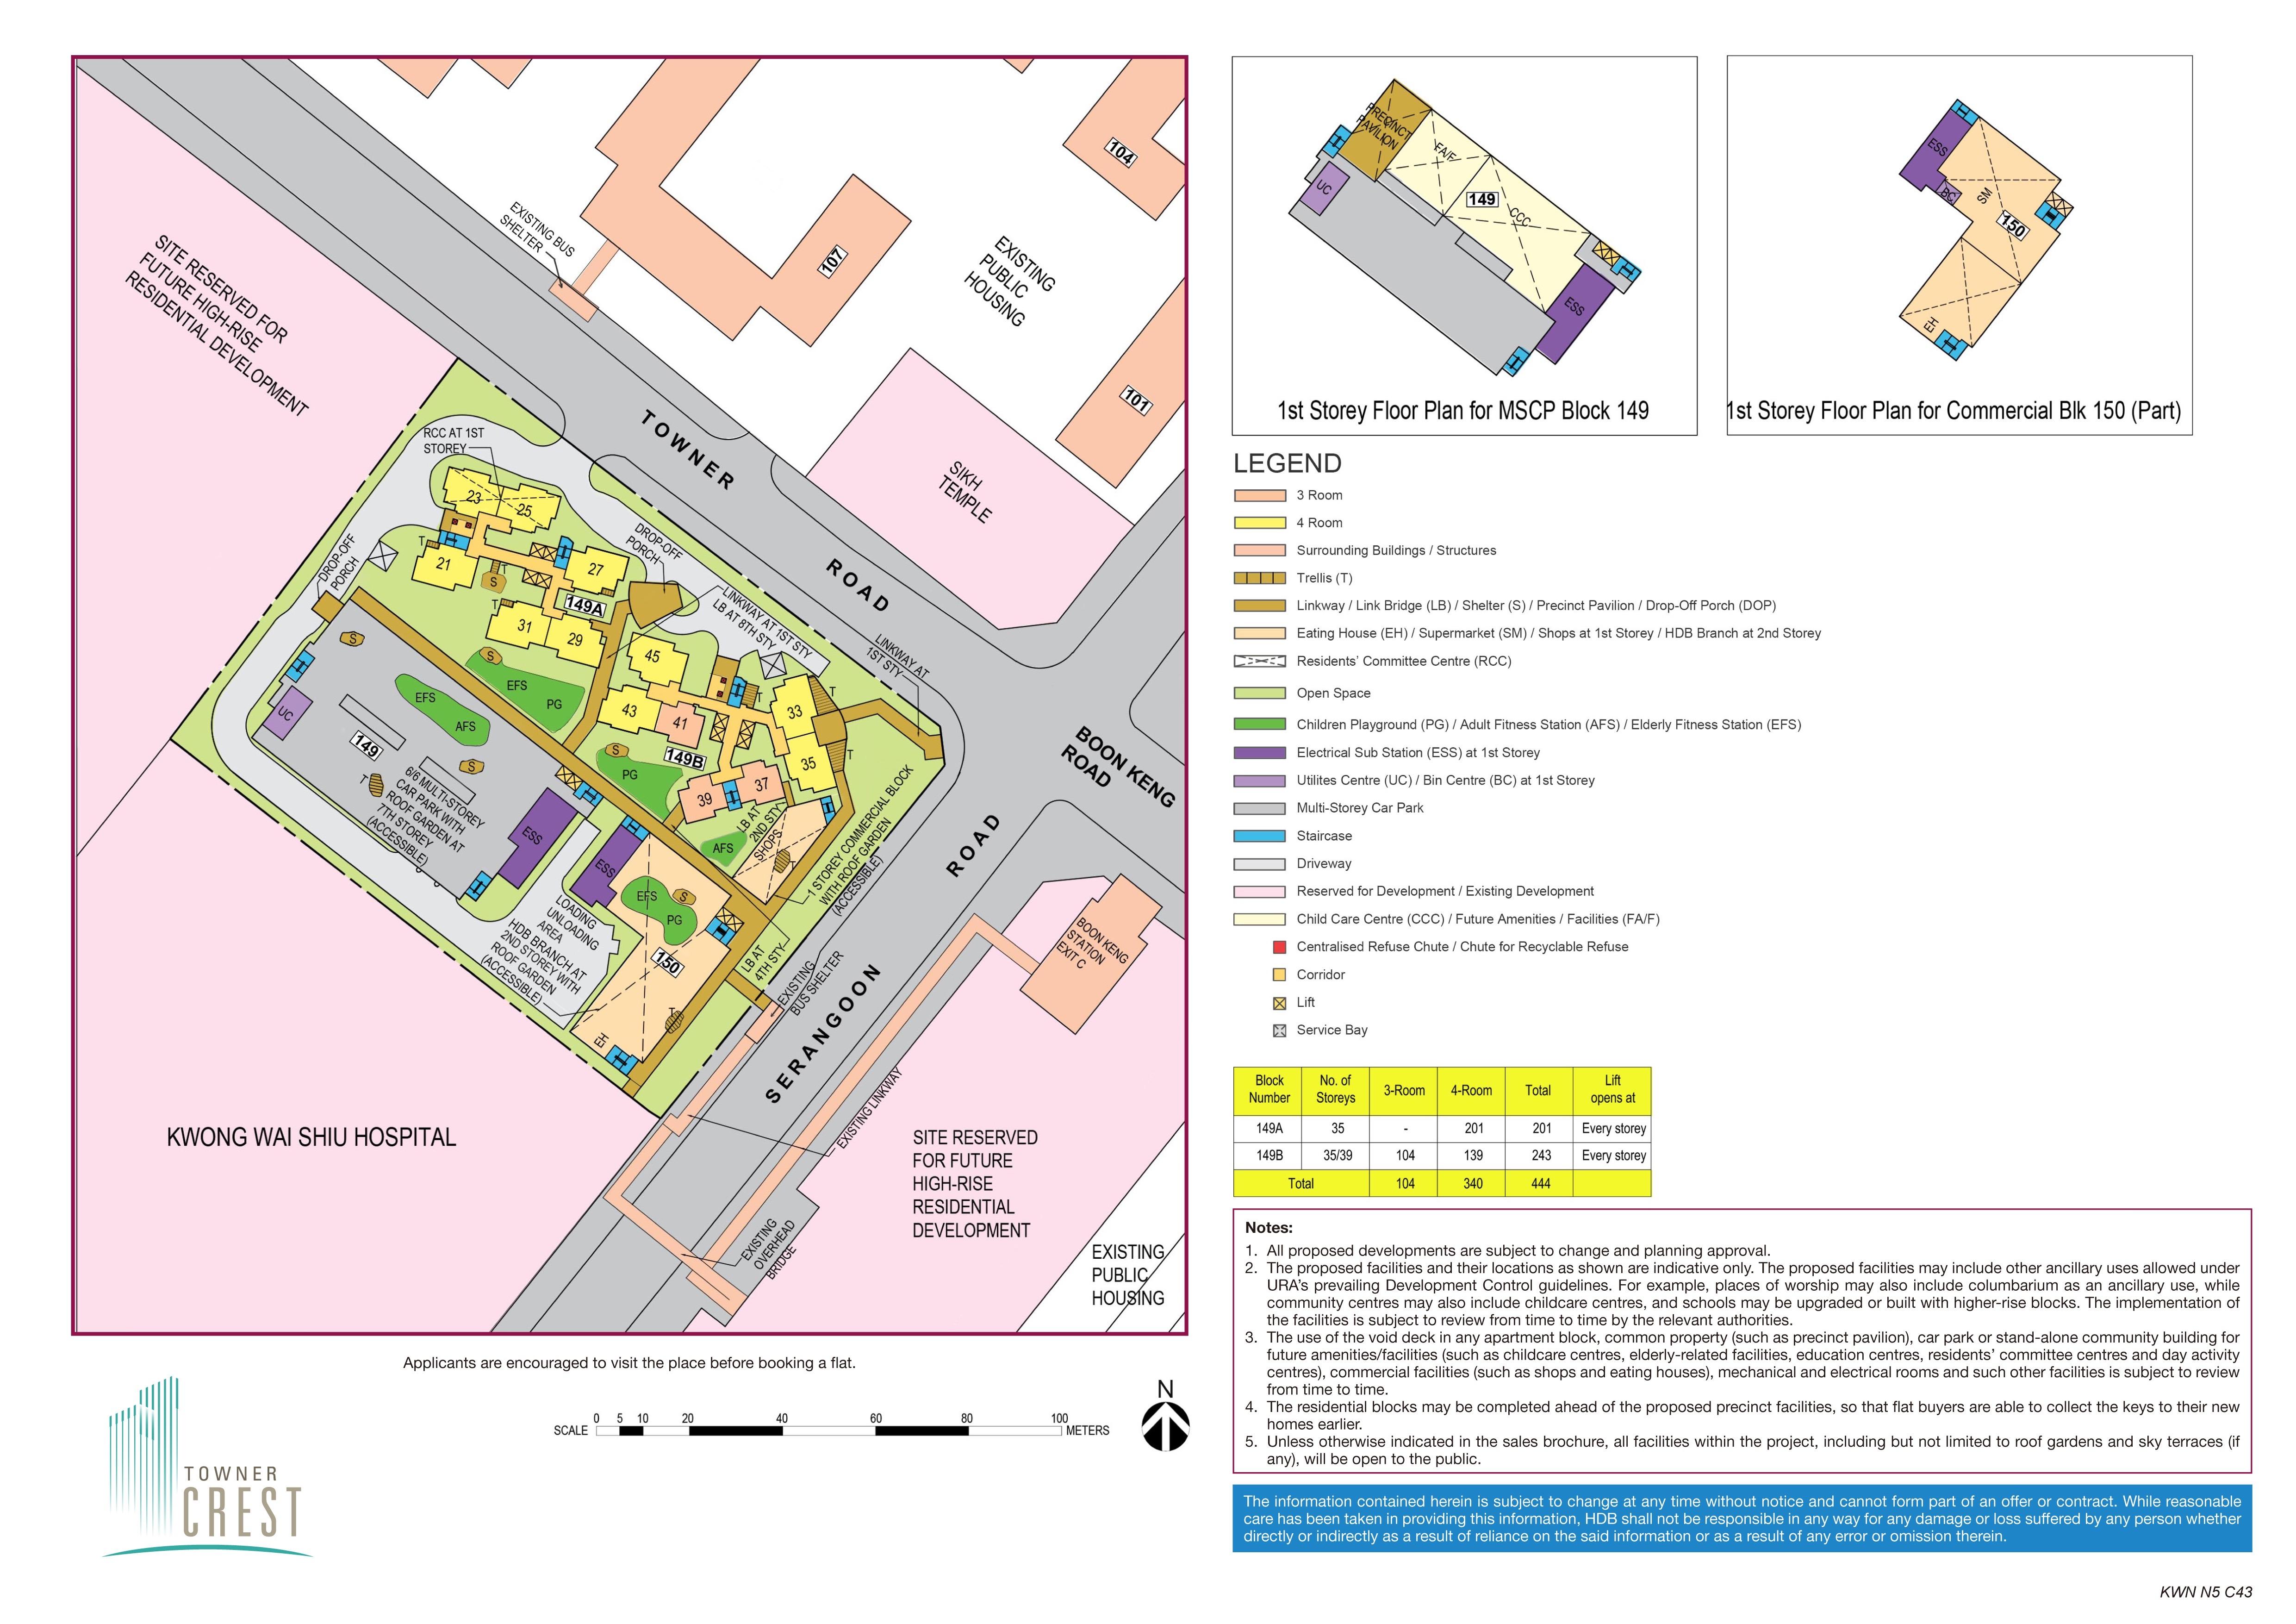 Towner Crest Site Plan